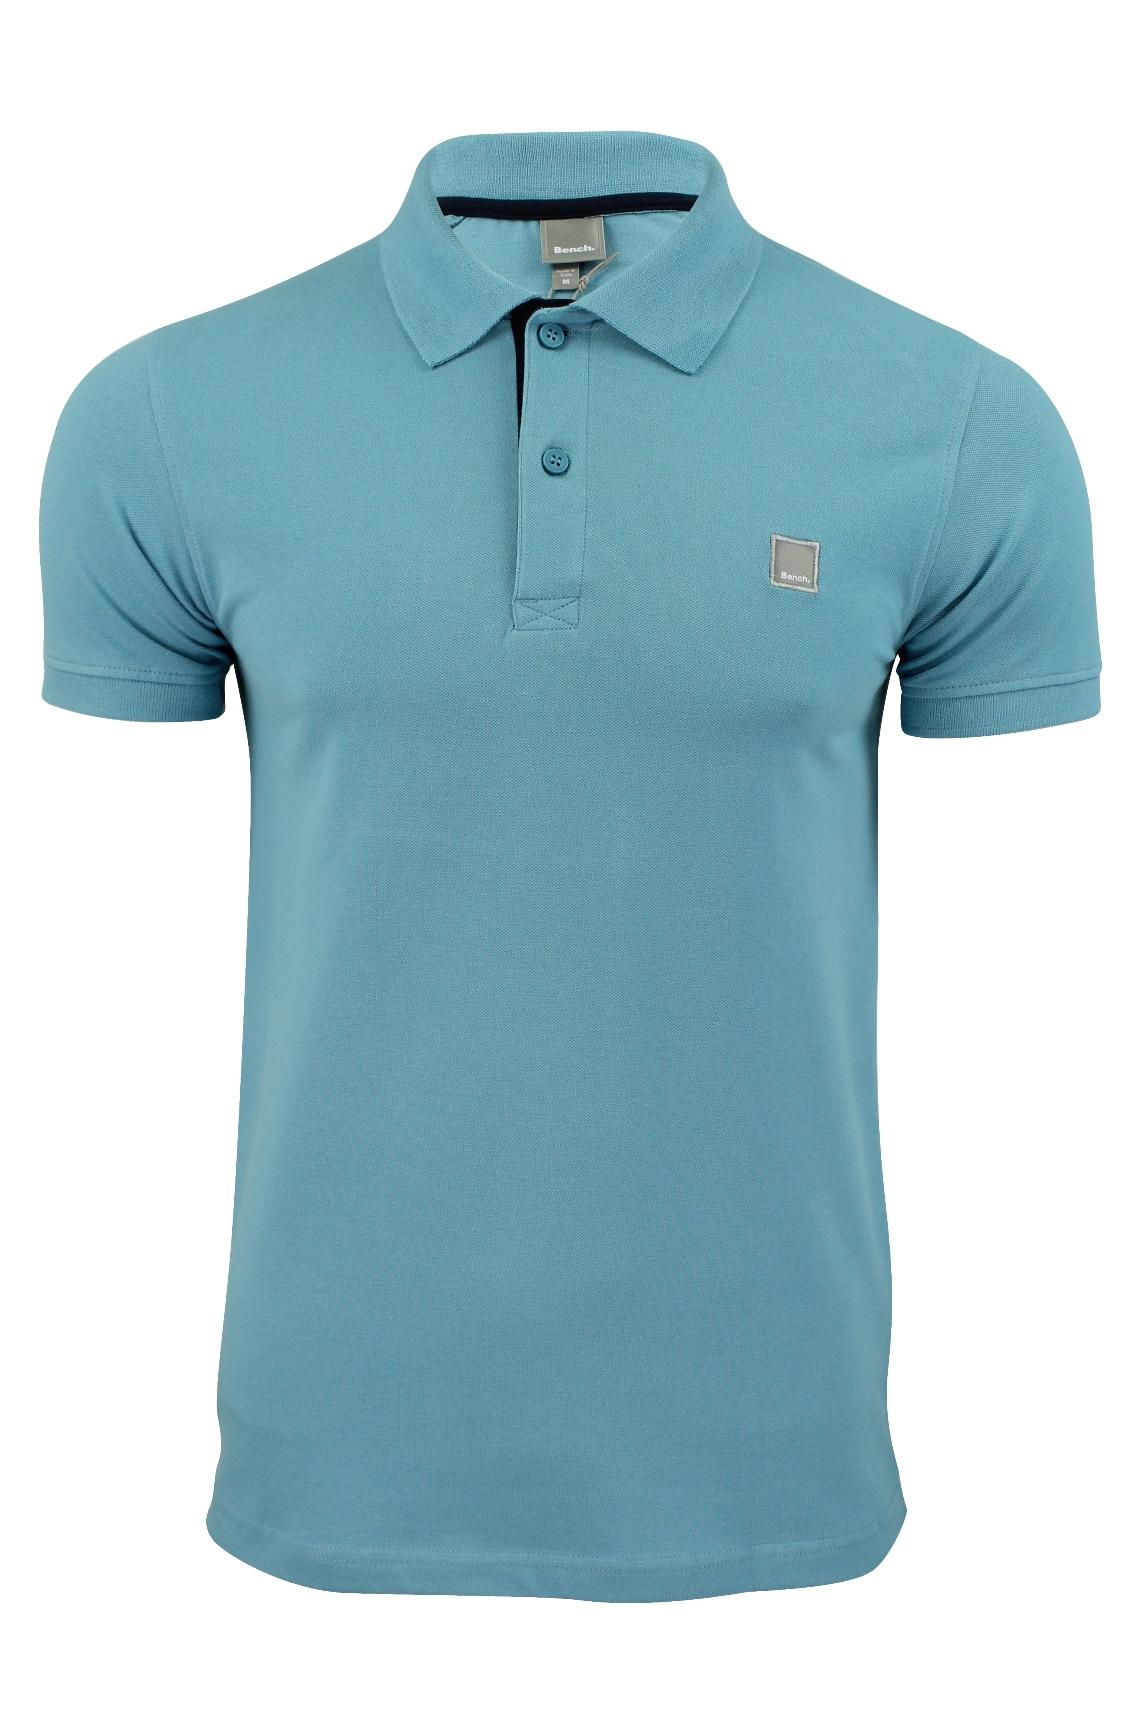 Mens polo shirt by bench 39 crystalline b 39 stretch pique for Stretch polo shirt mens